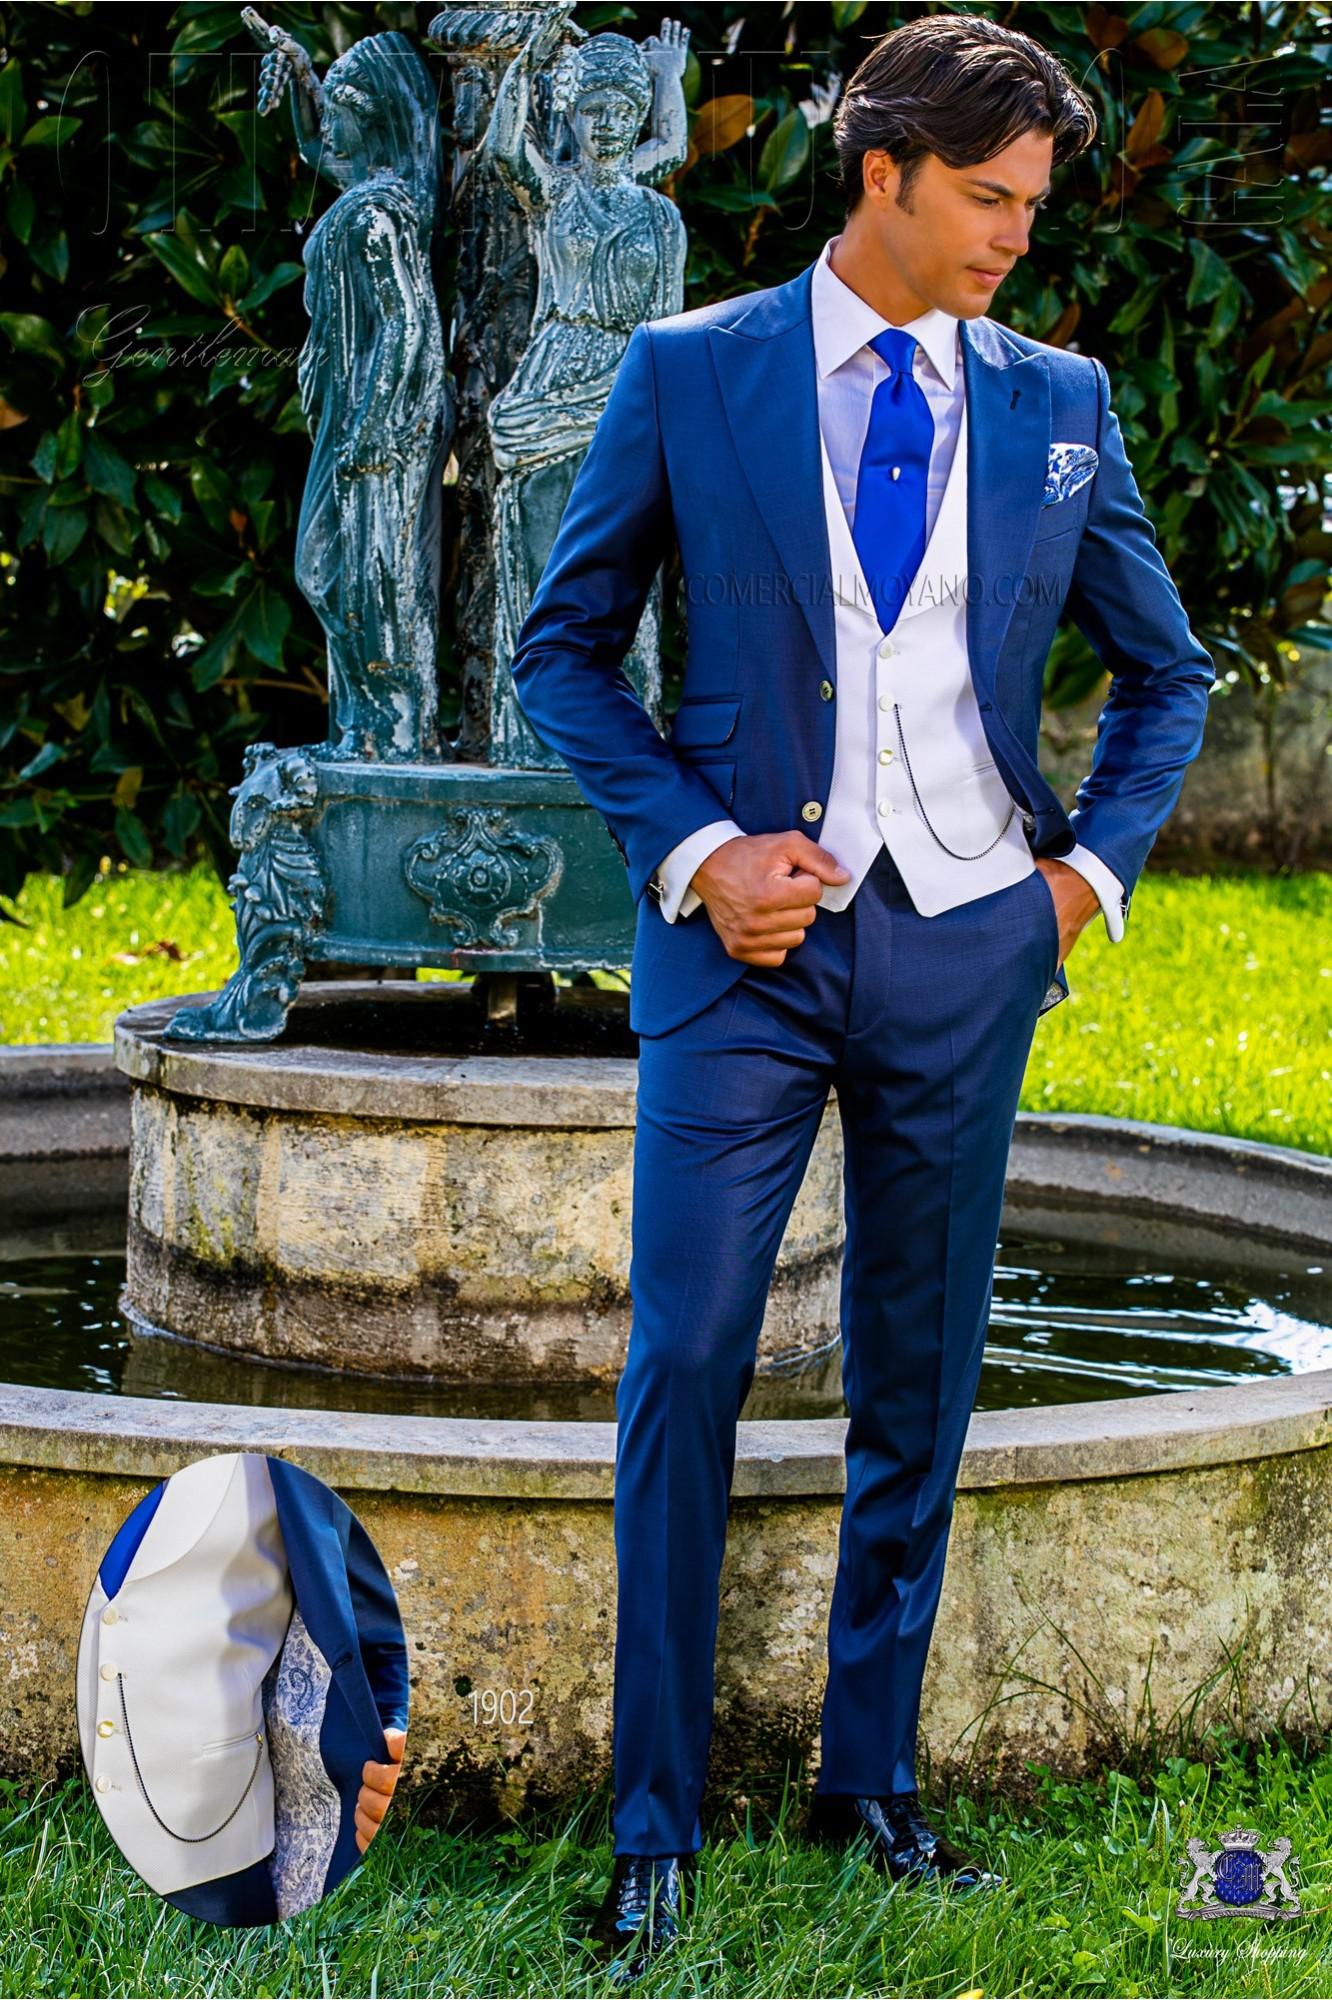 Italian bespoke suit royal blue cool wool mix model 1902 Ottavio Nuccio Gala